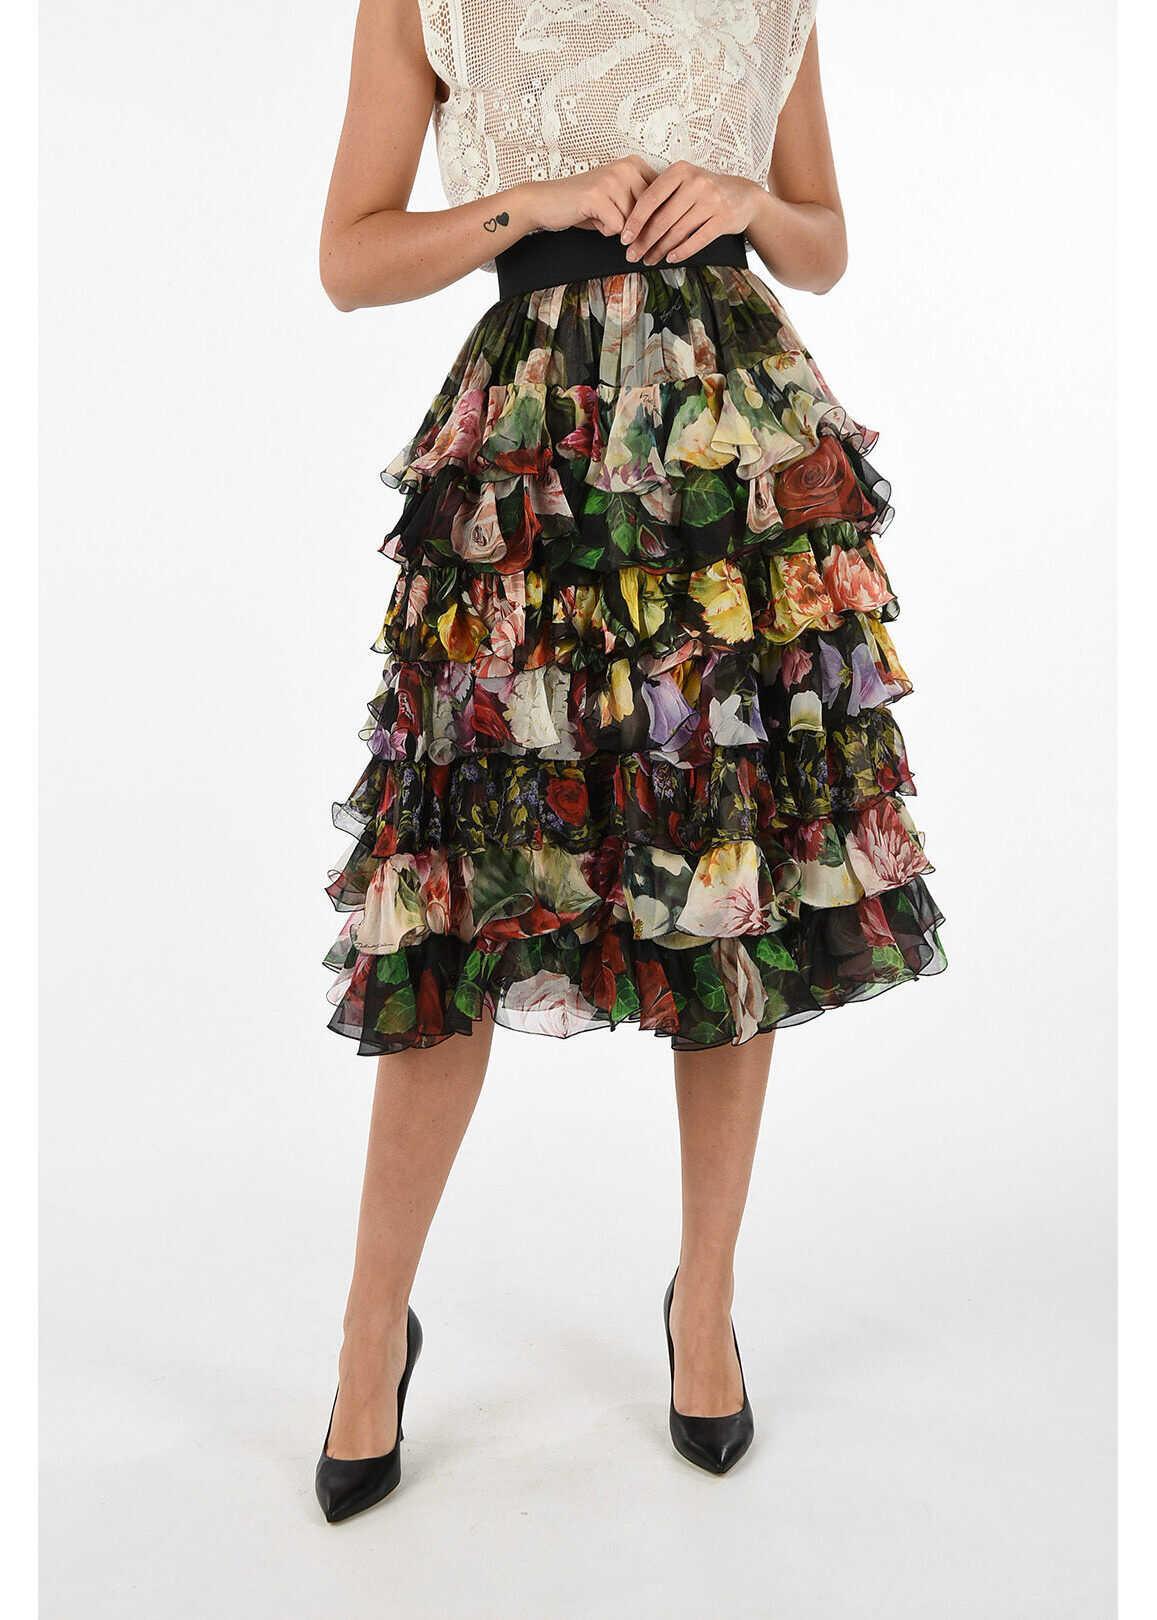 Dolce & Gabbana Silk floral-print layered skirt MULTICOLOR